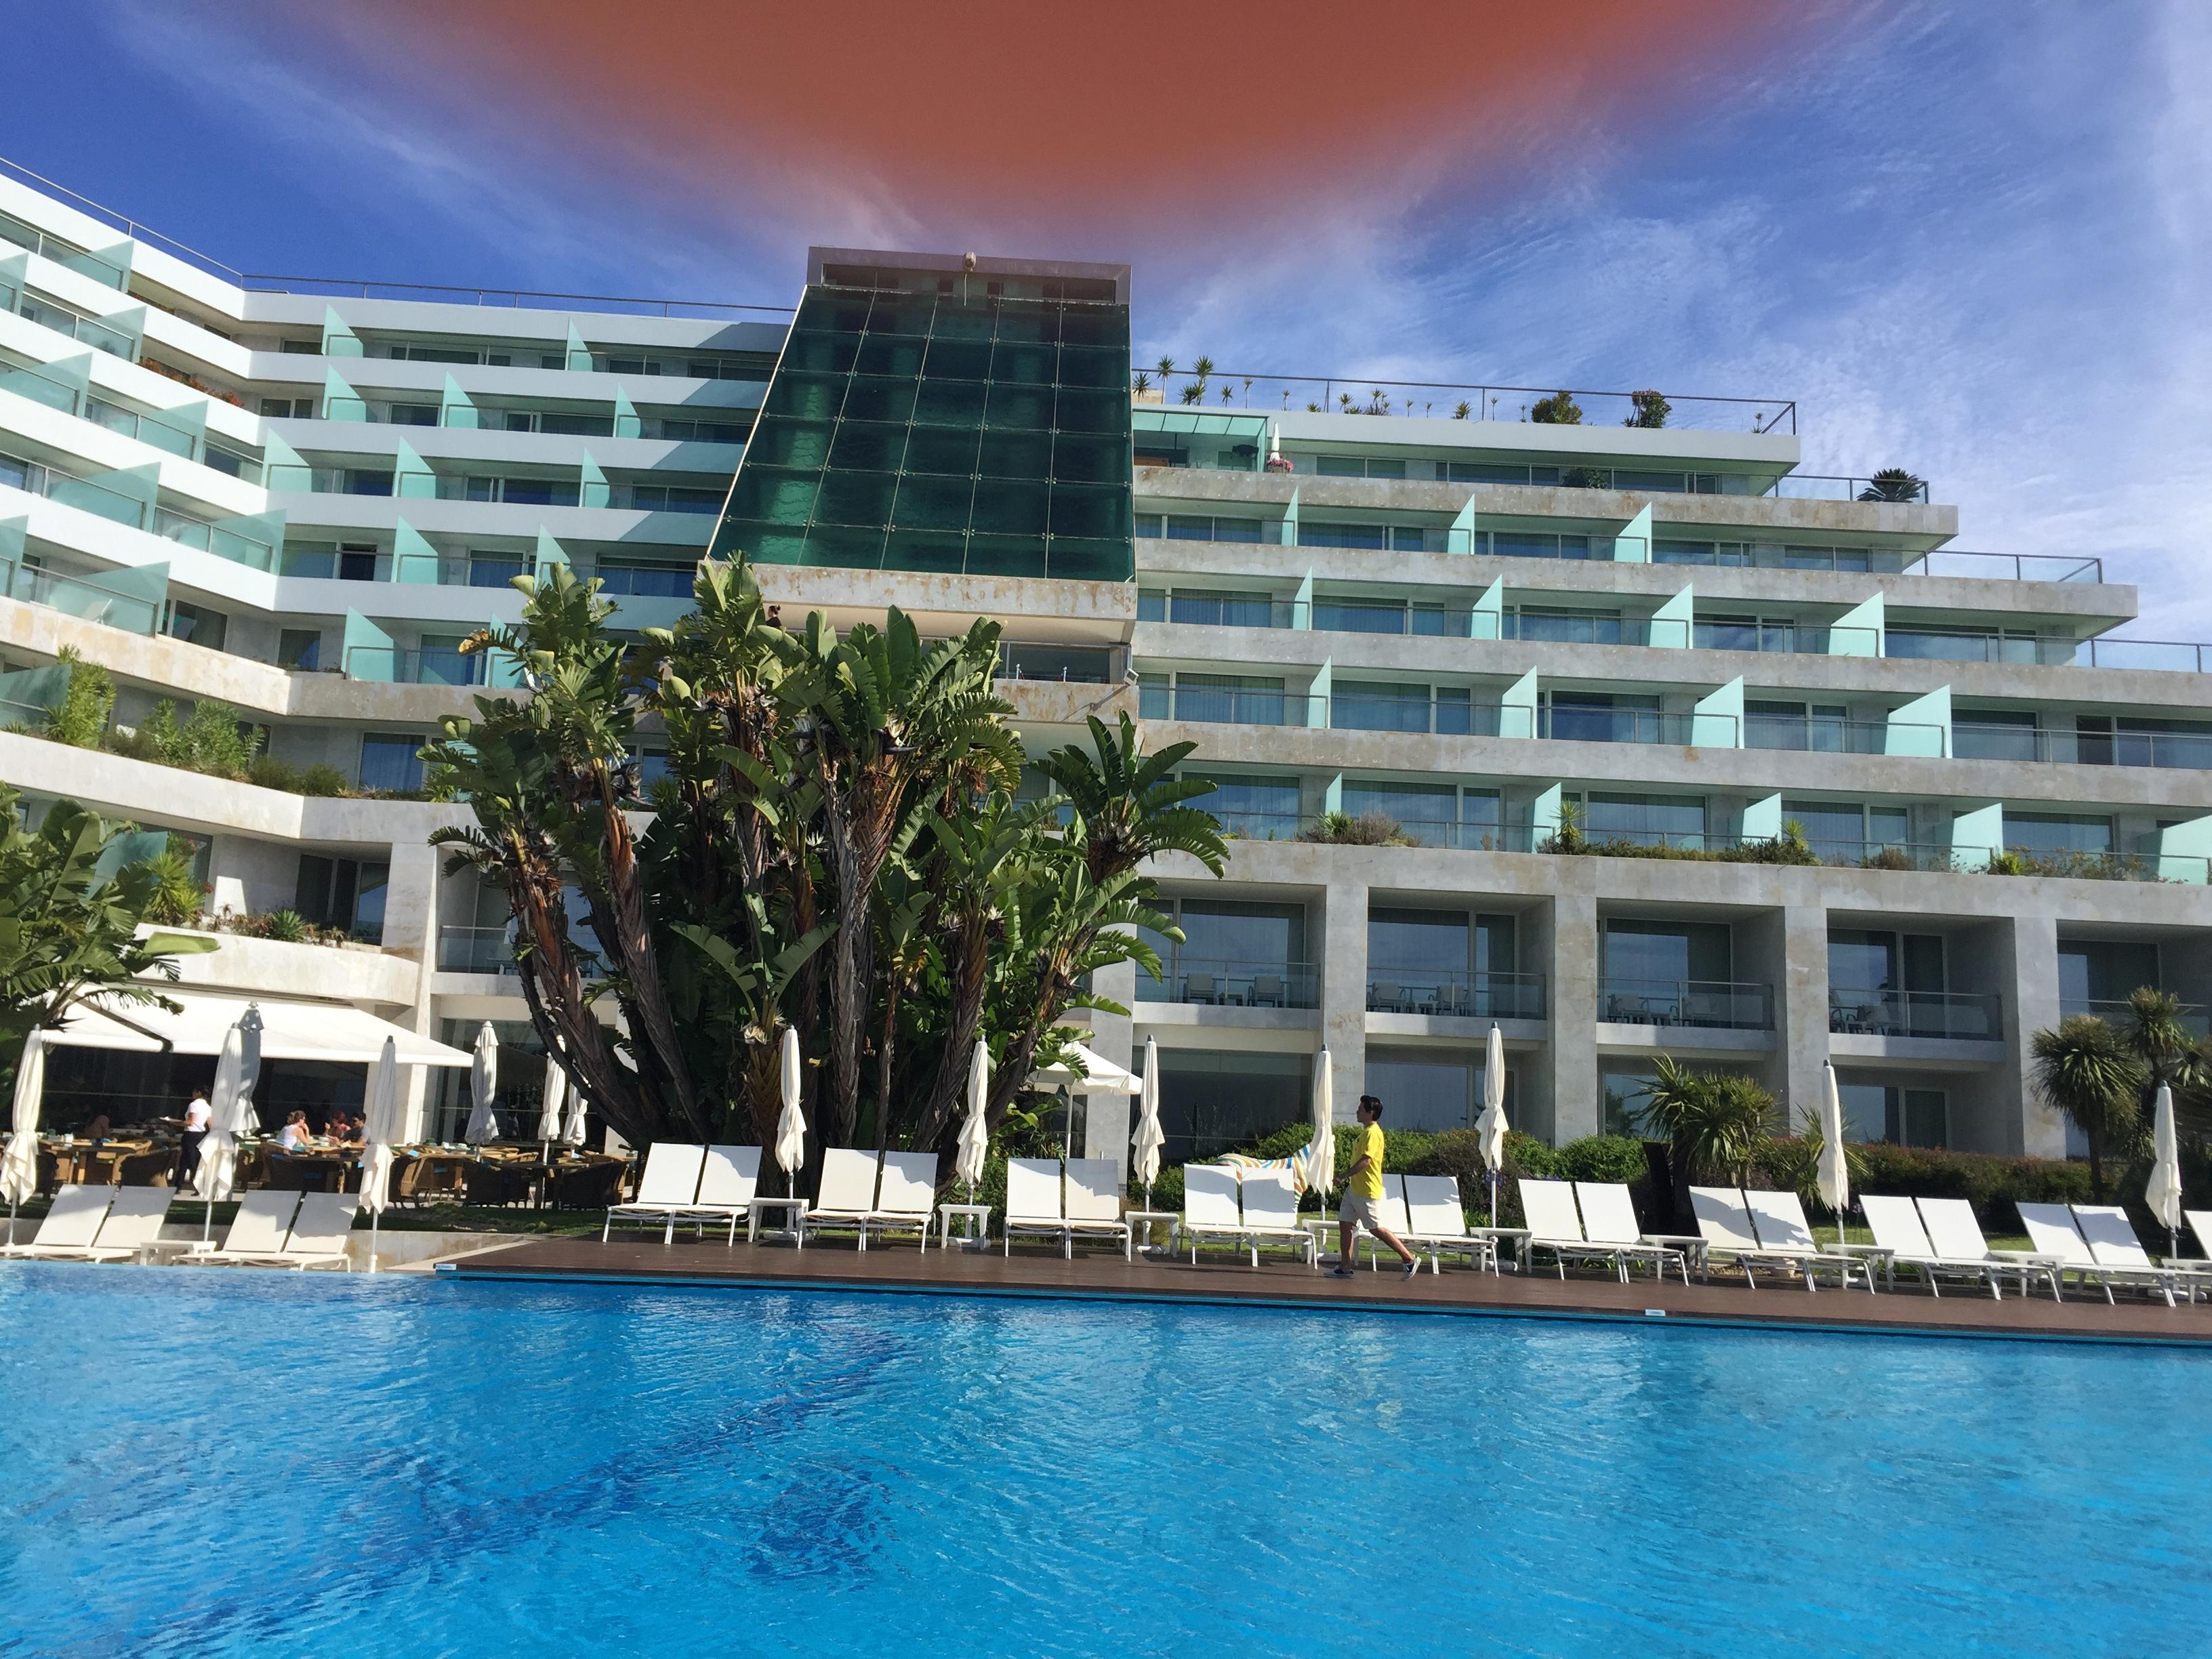 Hotel piscine dans la chambre le wellness du nirvana la for Chauffe piscine nirvana